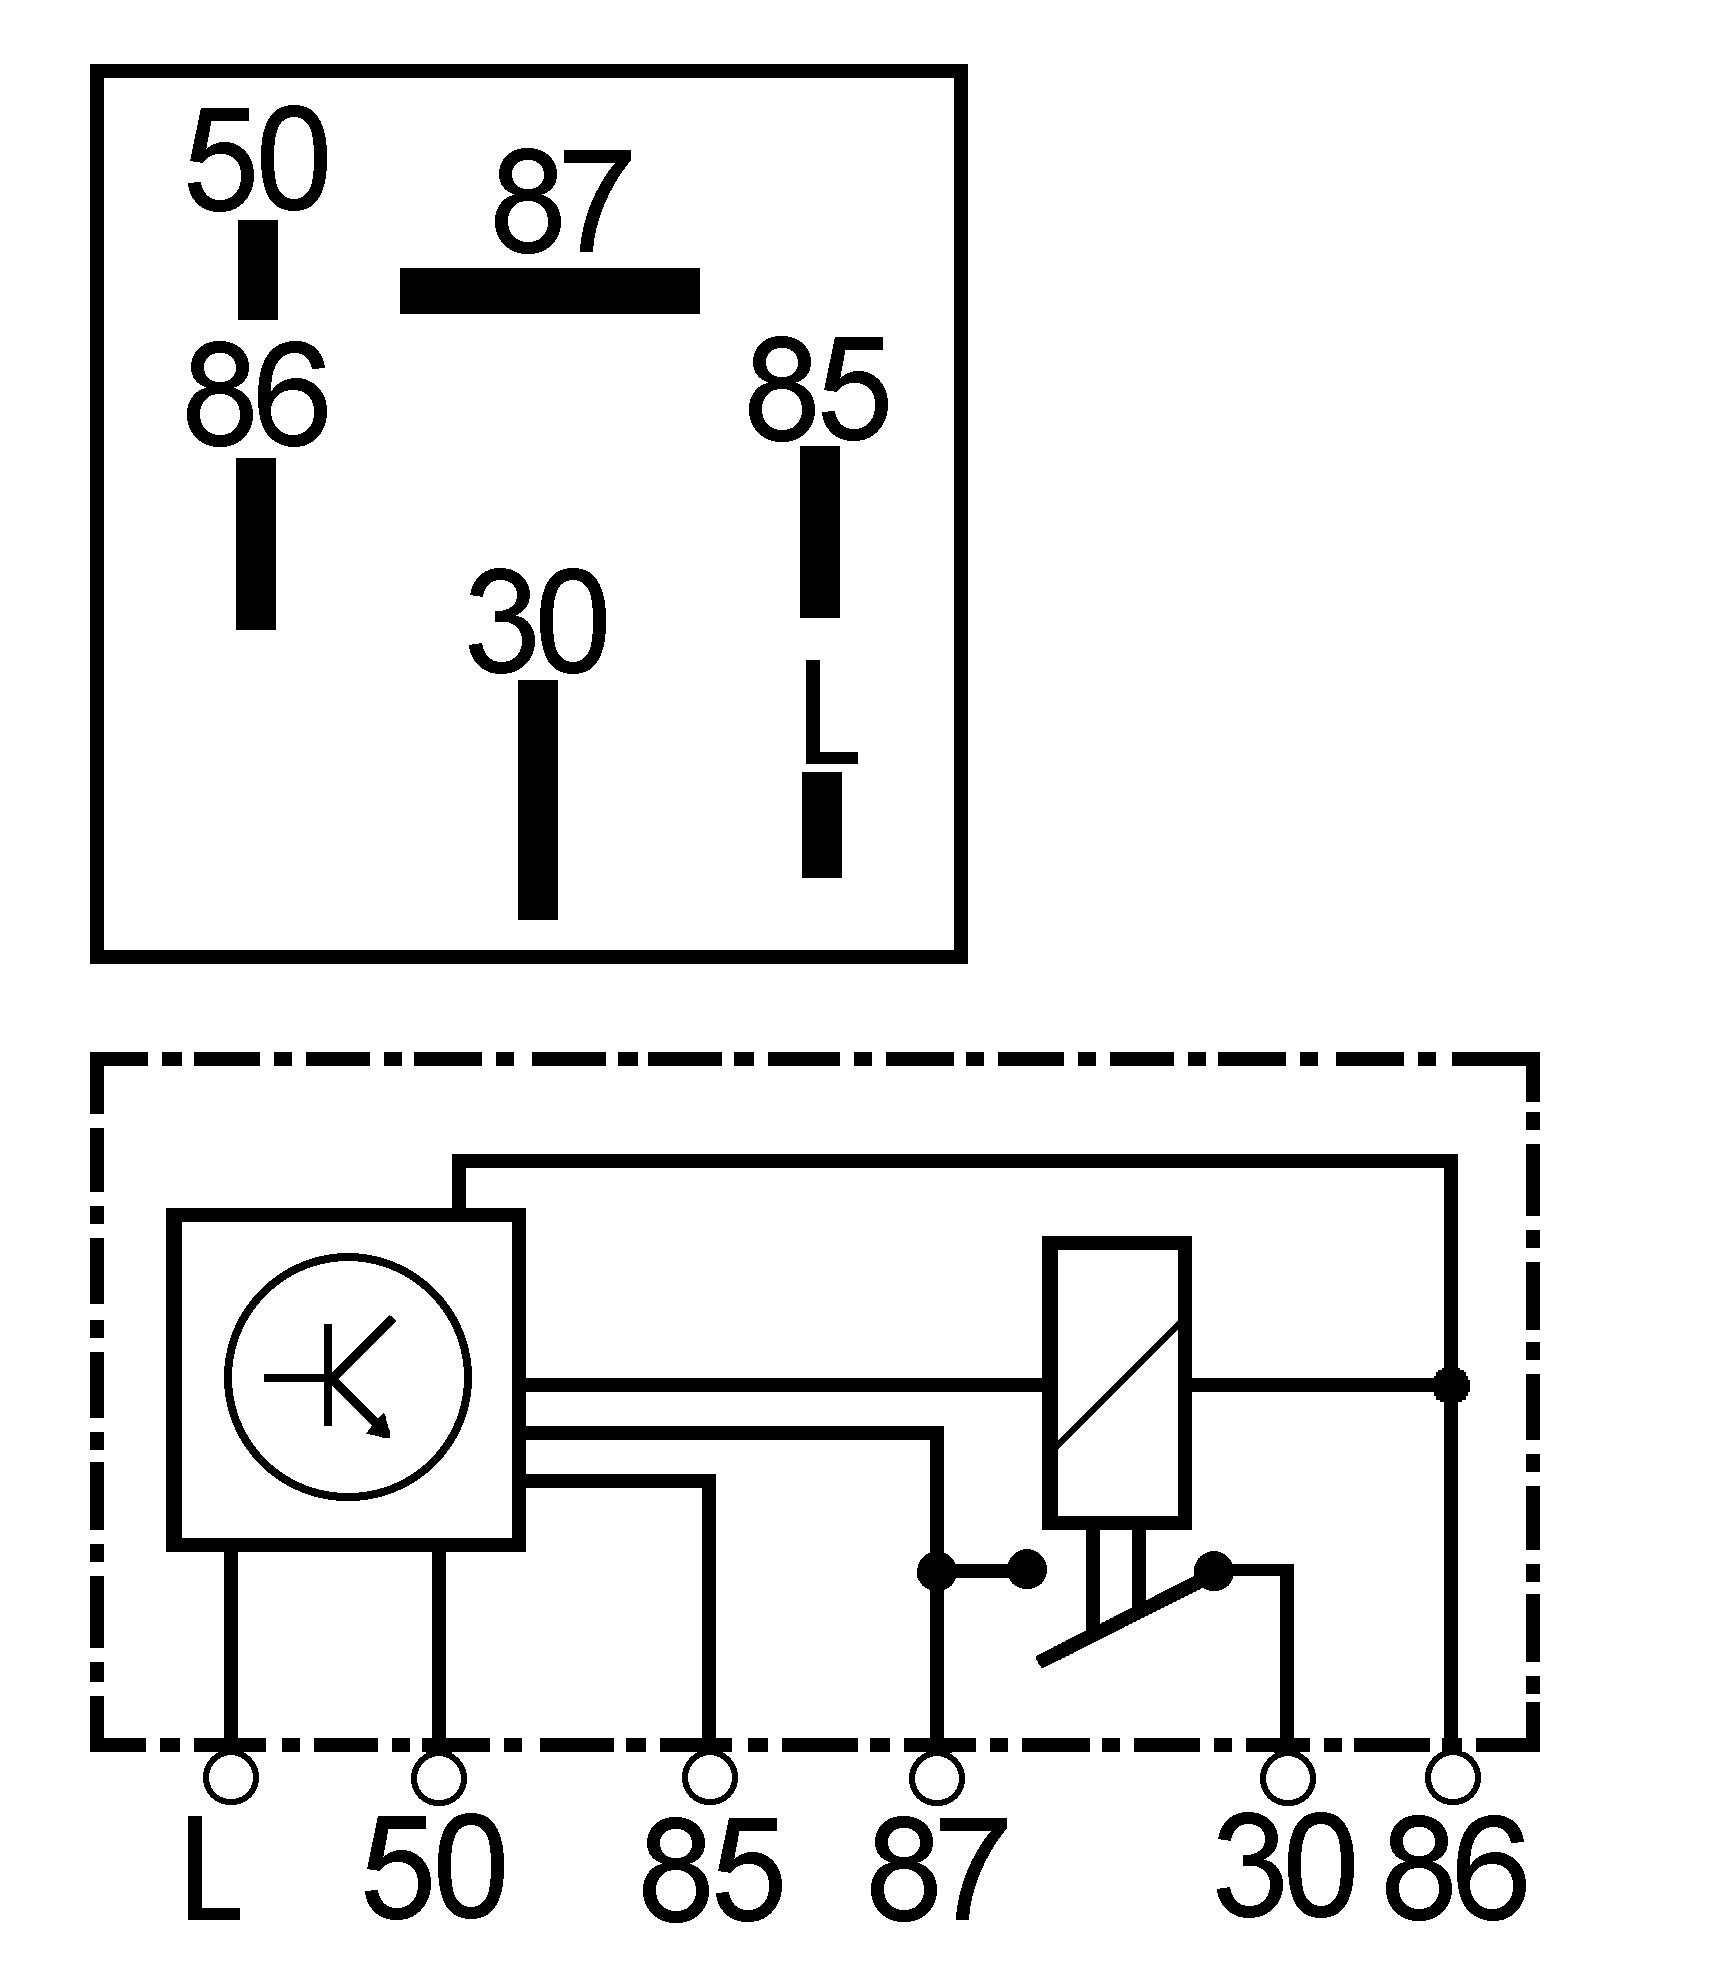 Glow Plug Relay Diagram - Wiring Diagram Data Oreo - 7.3 Glow Plug Relay Wiring Diagram